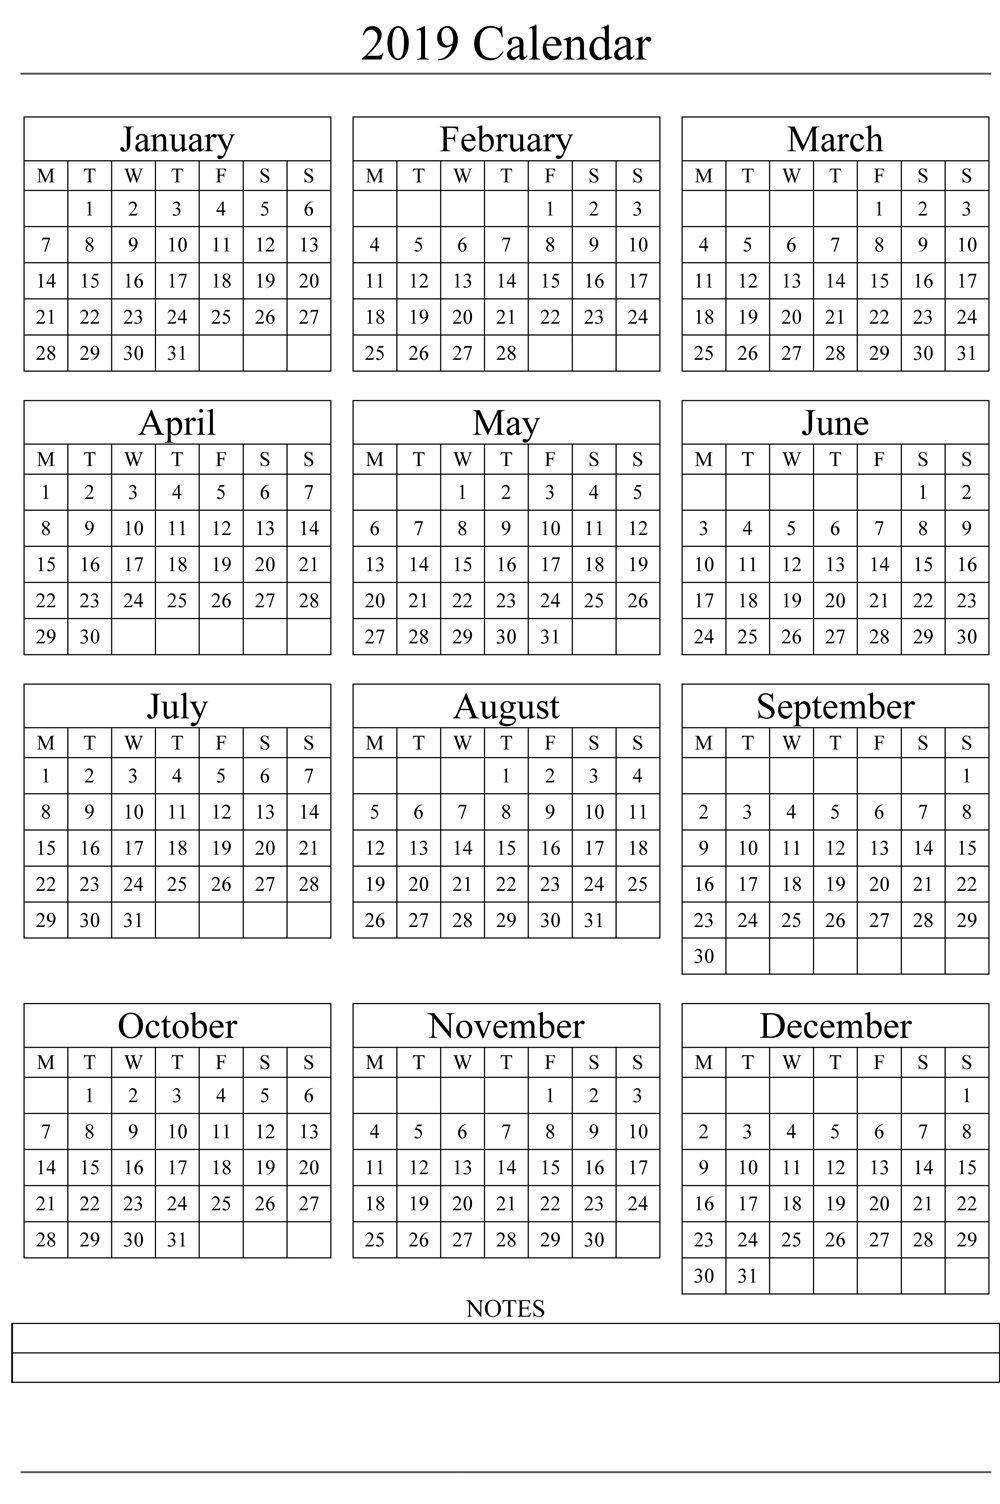 Free Printable Fill In Calendars 2021 | Calendar Template regarding Free Fill In Calendar Template